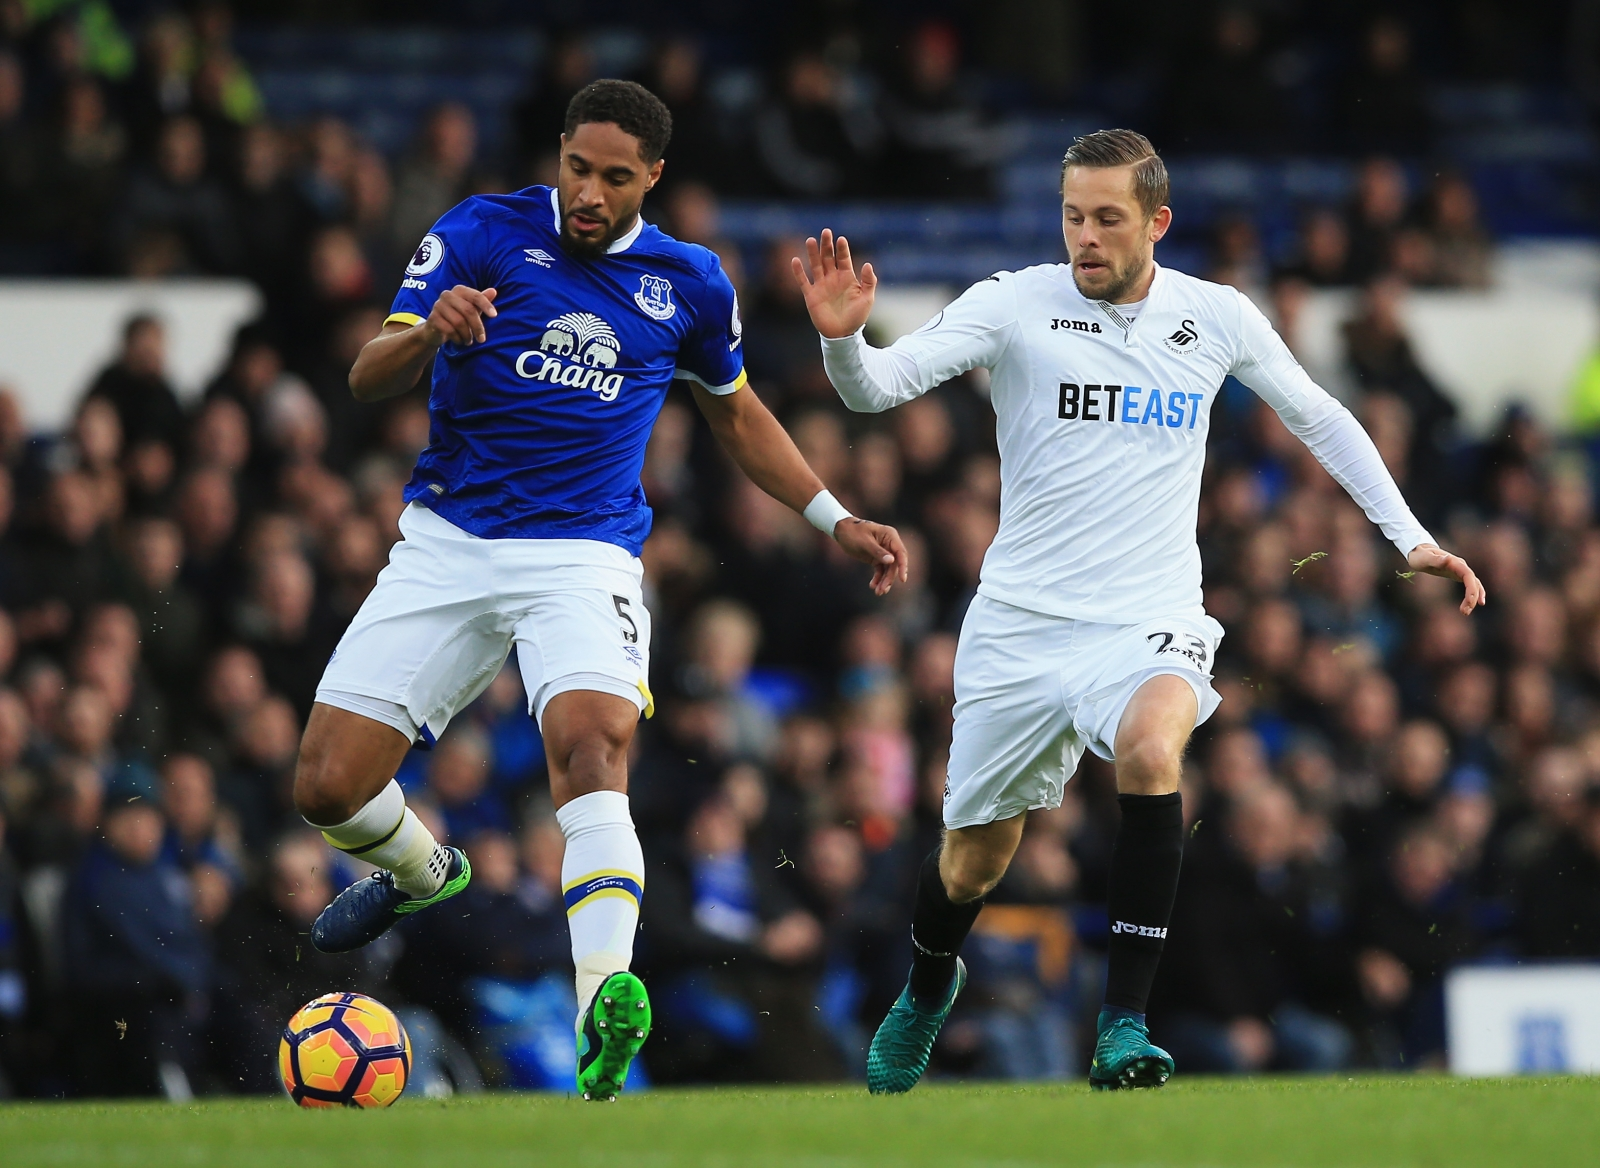 Paul Clement urges Gylfi Sigurdsson to resist Everton interest and